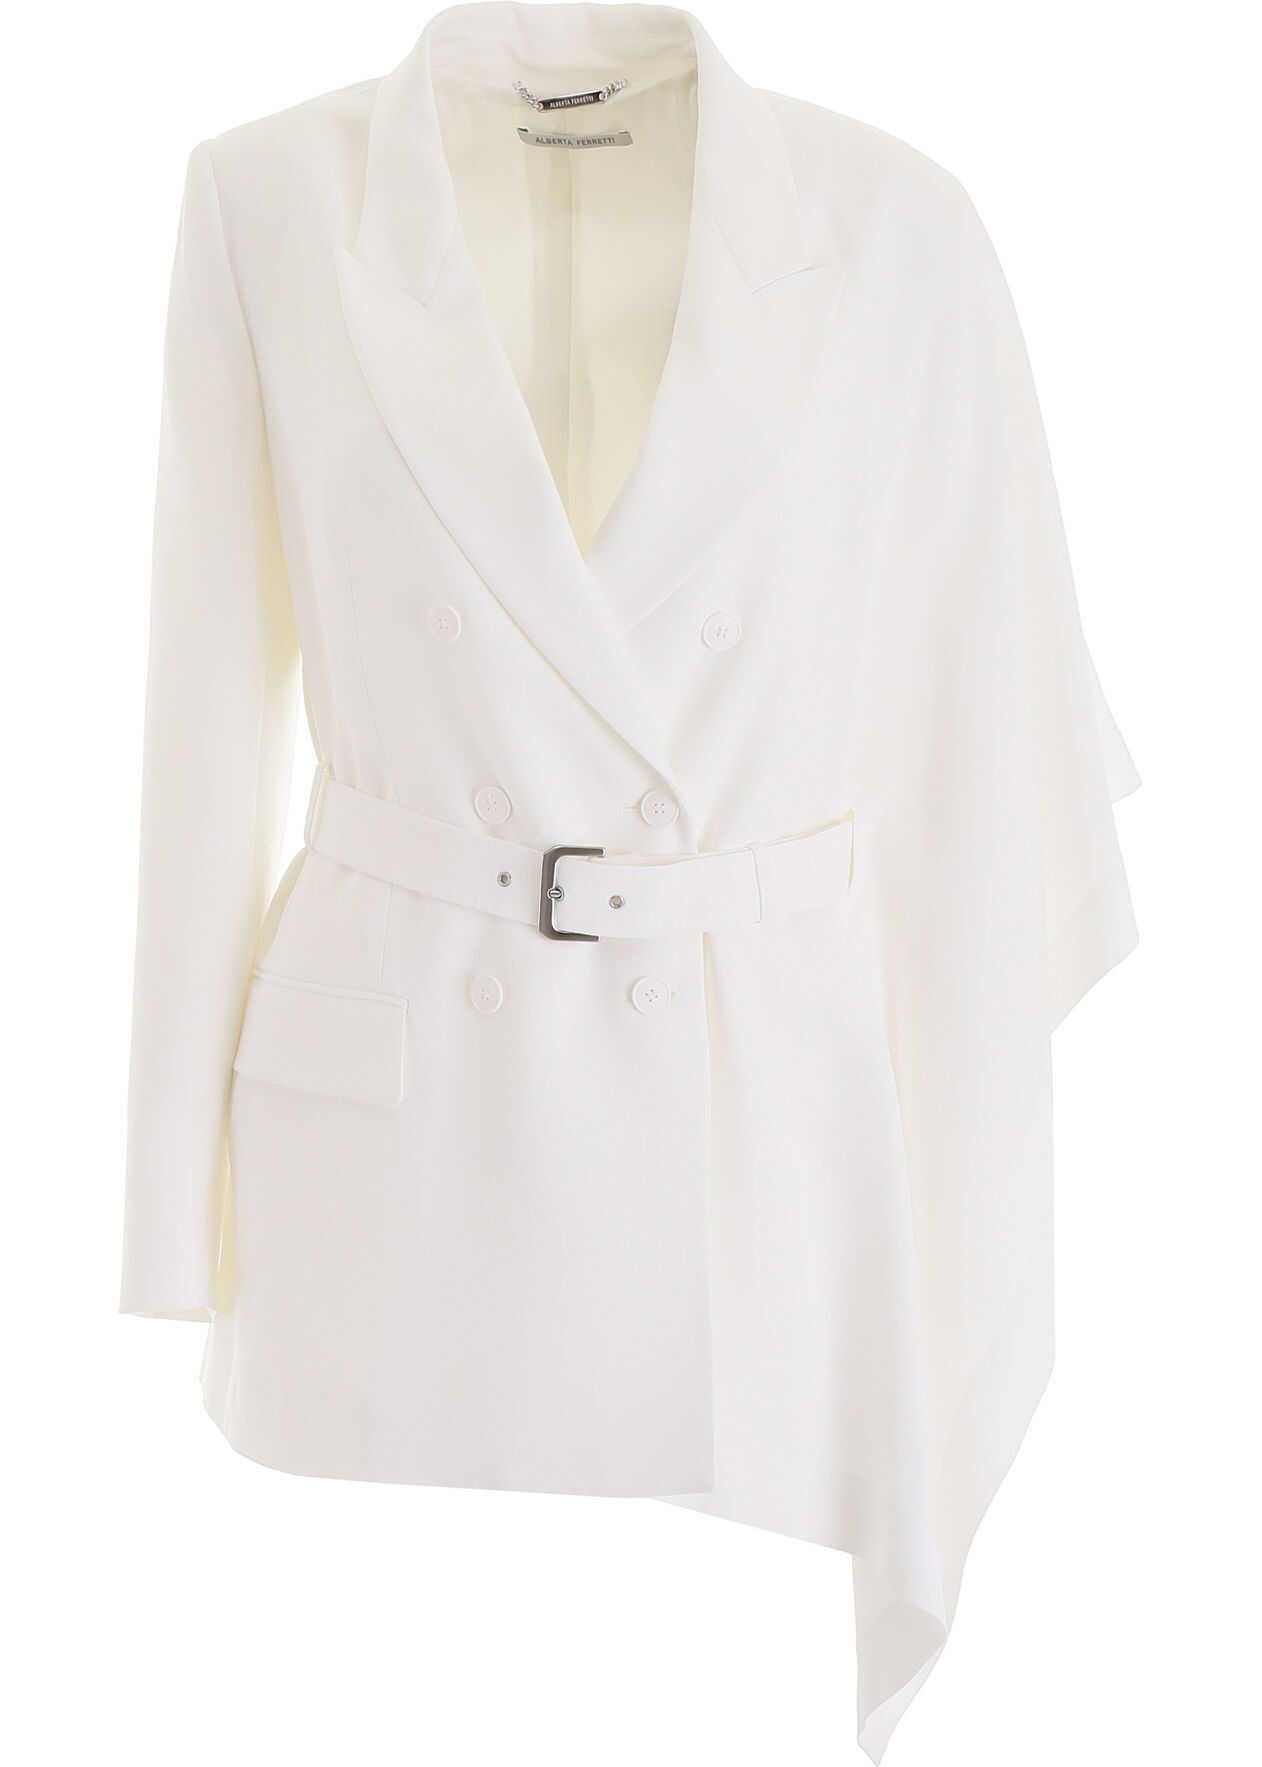 Alberta Ferretti Belted Jacket WHITE